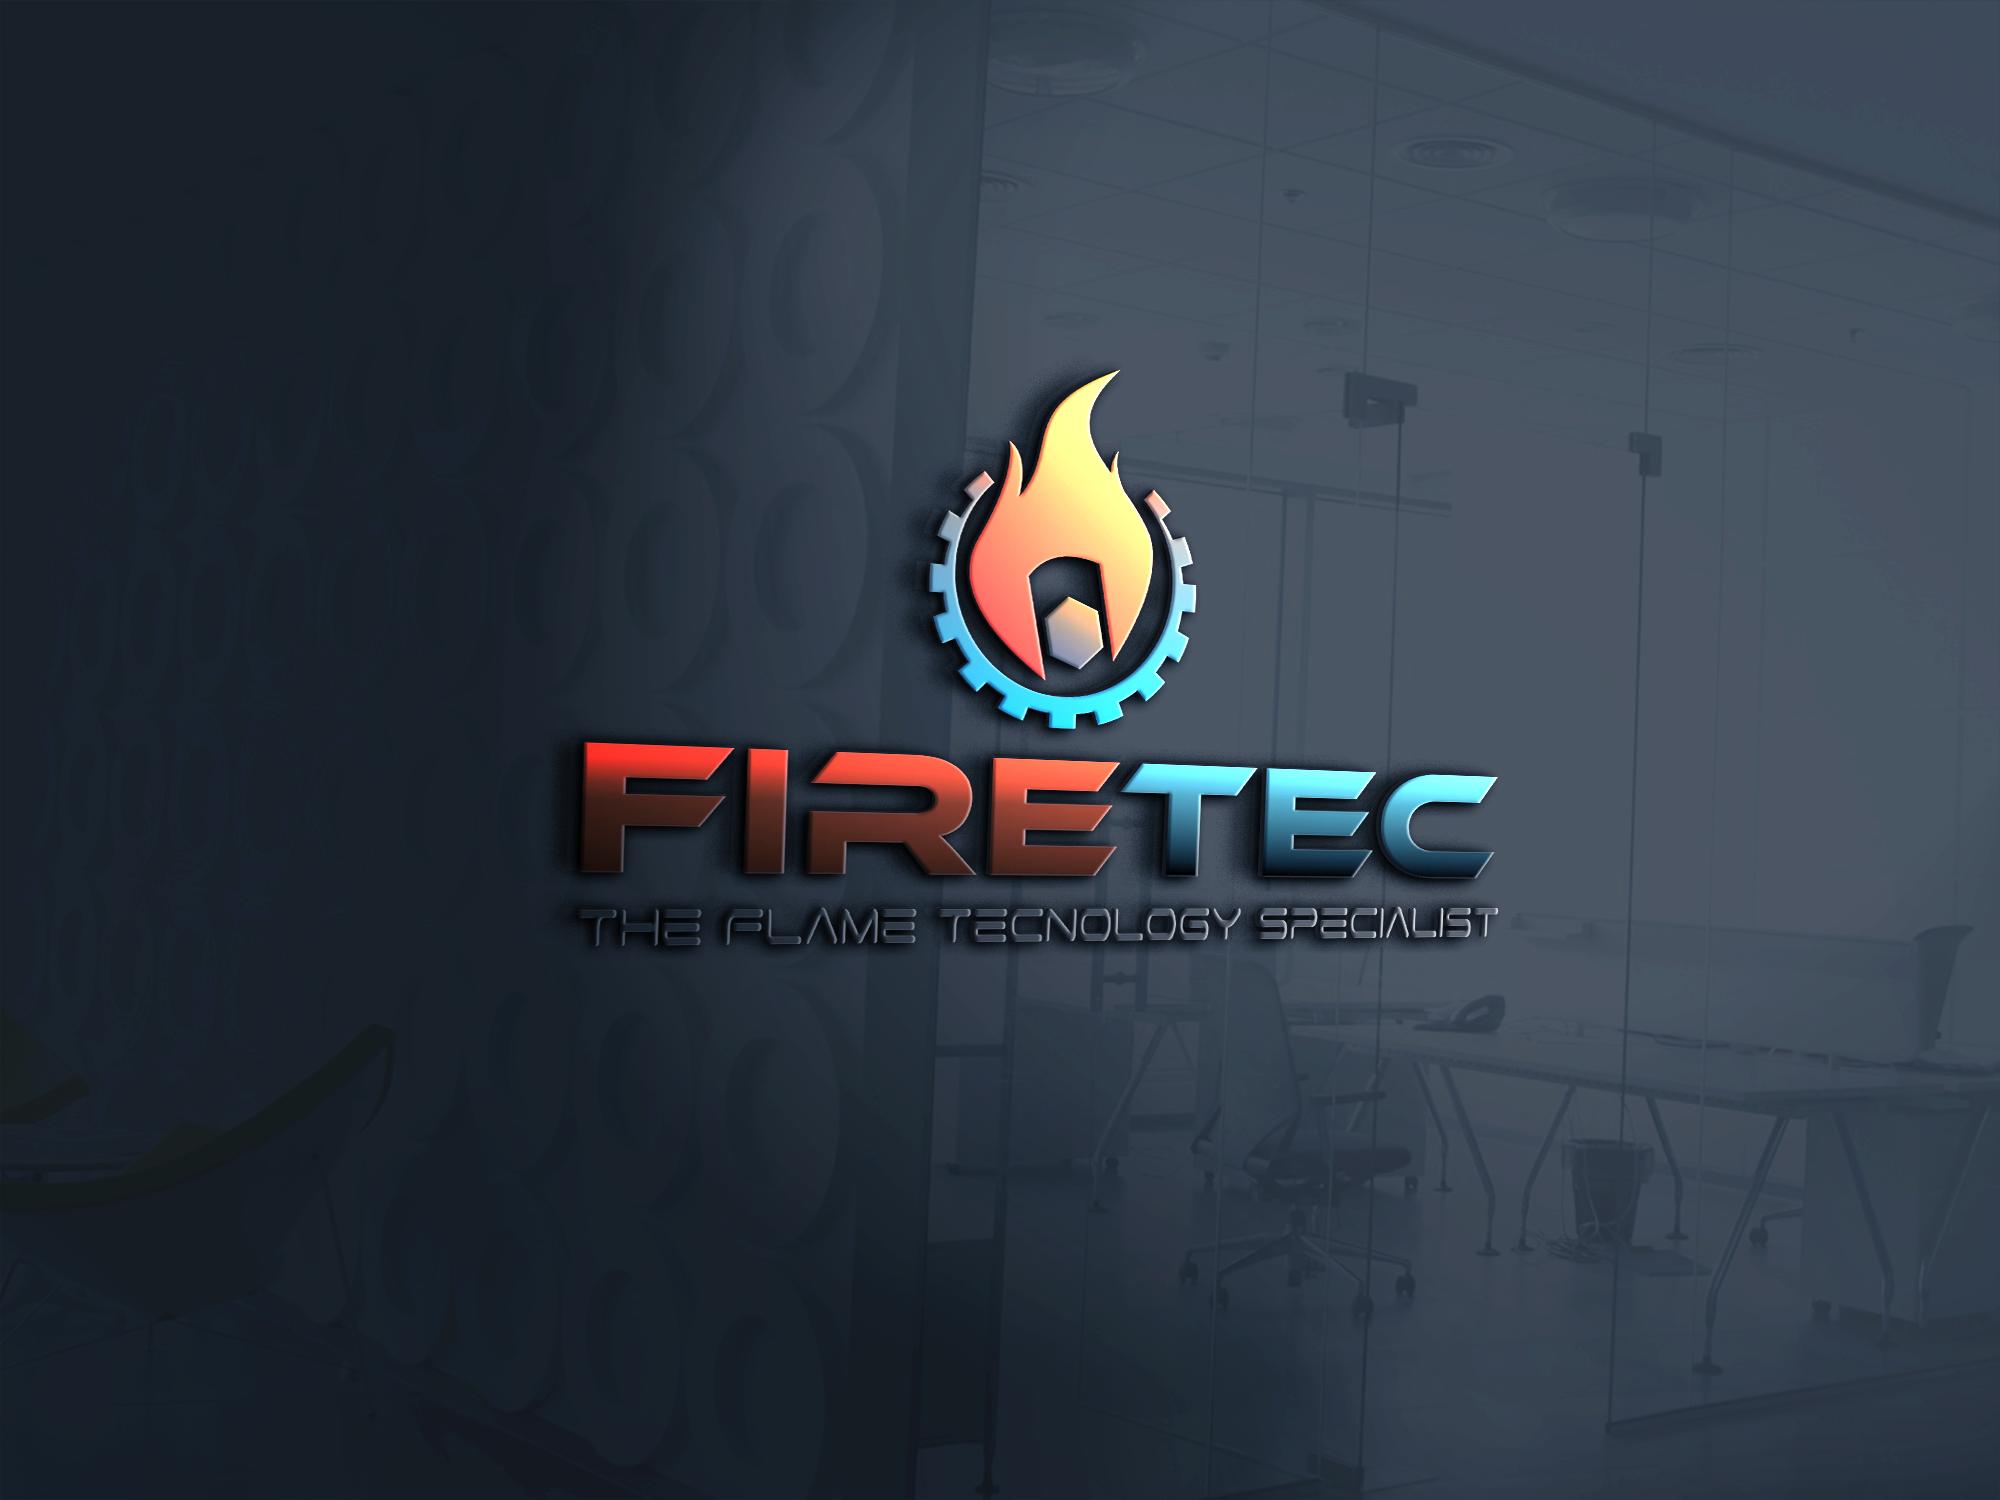 FIRETEC